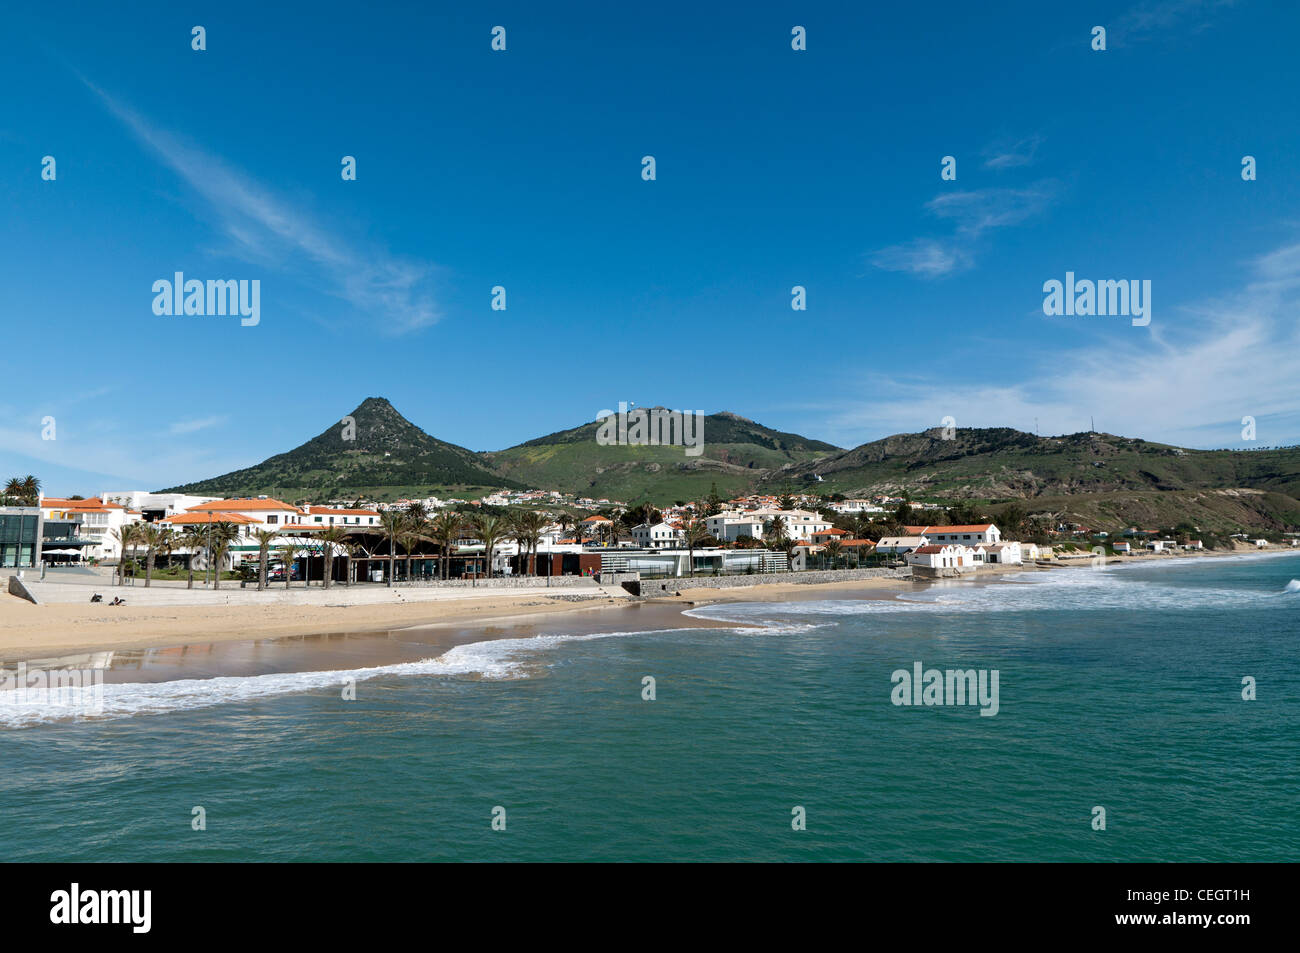 Porto Santo beach, Portugal - Stock Image